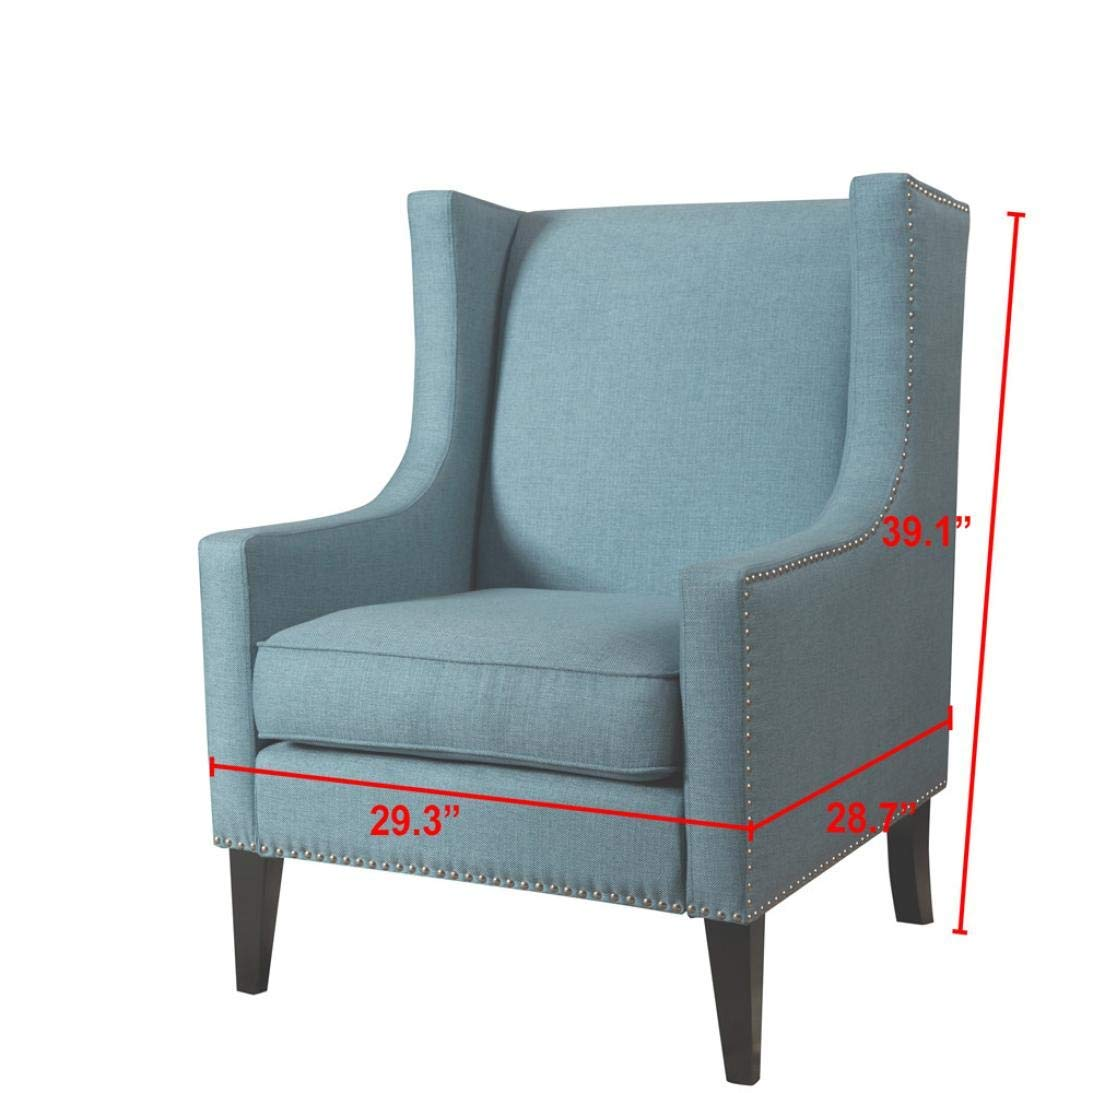 Dreamyth Simple Solid Color Modern Sofa Chair 29.3X28.7X39.6 Inch,American Warehouse Shippment